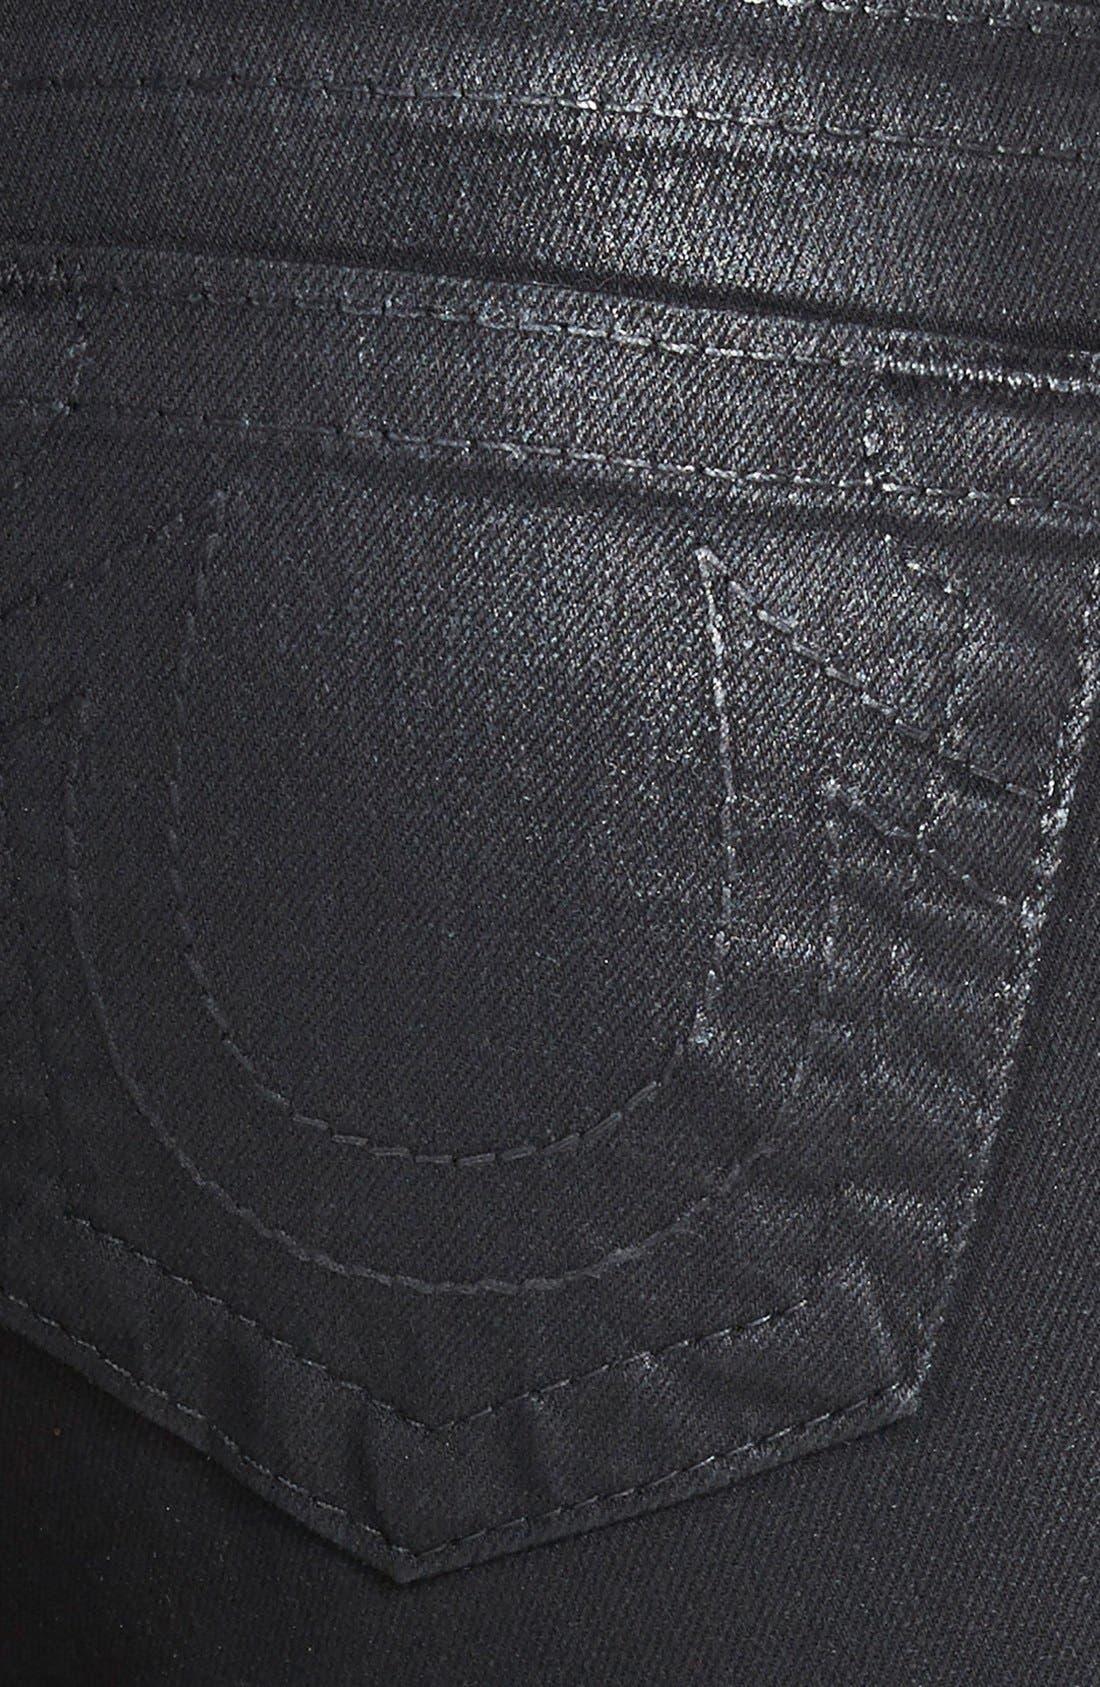 Alternate Image 3  - True Religion Brand Jeans 'Halle - Super Vixen' Coated Skinny Jeans (Black)